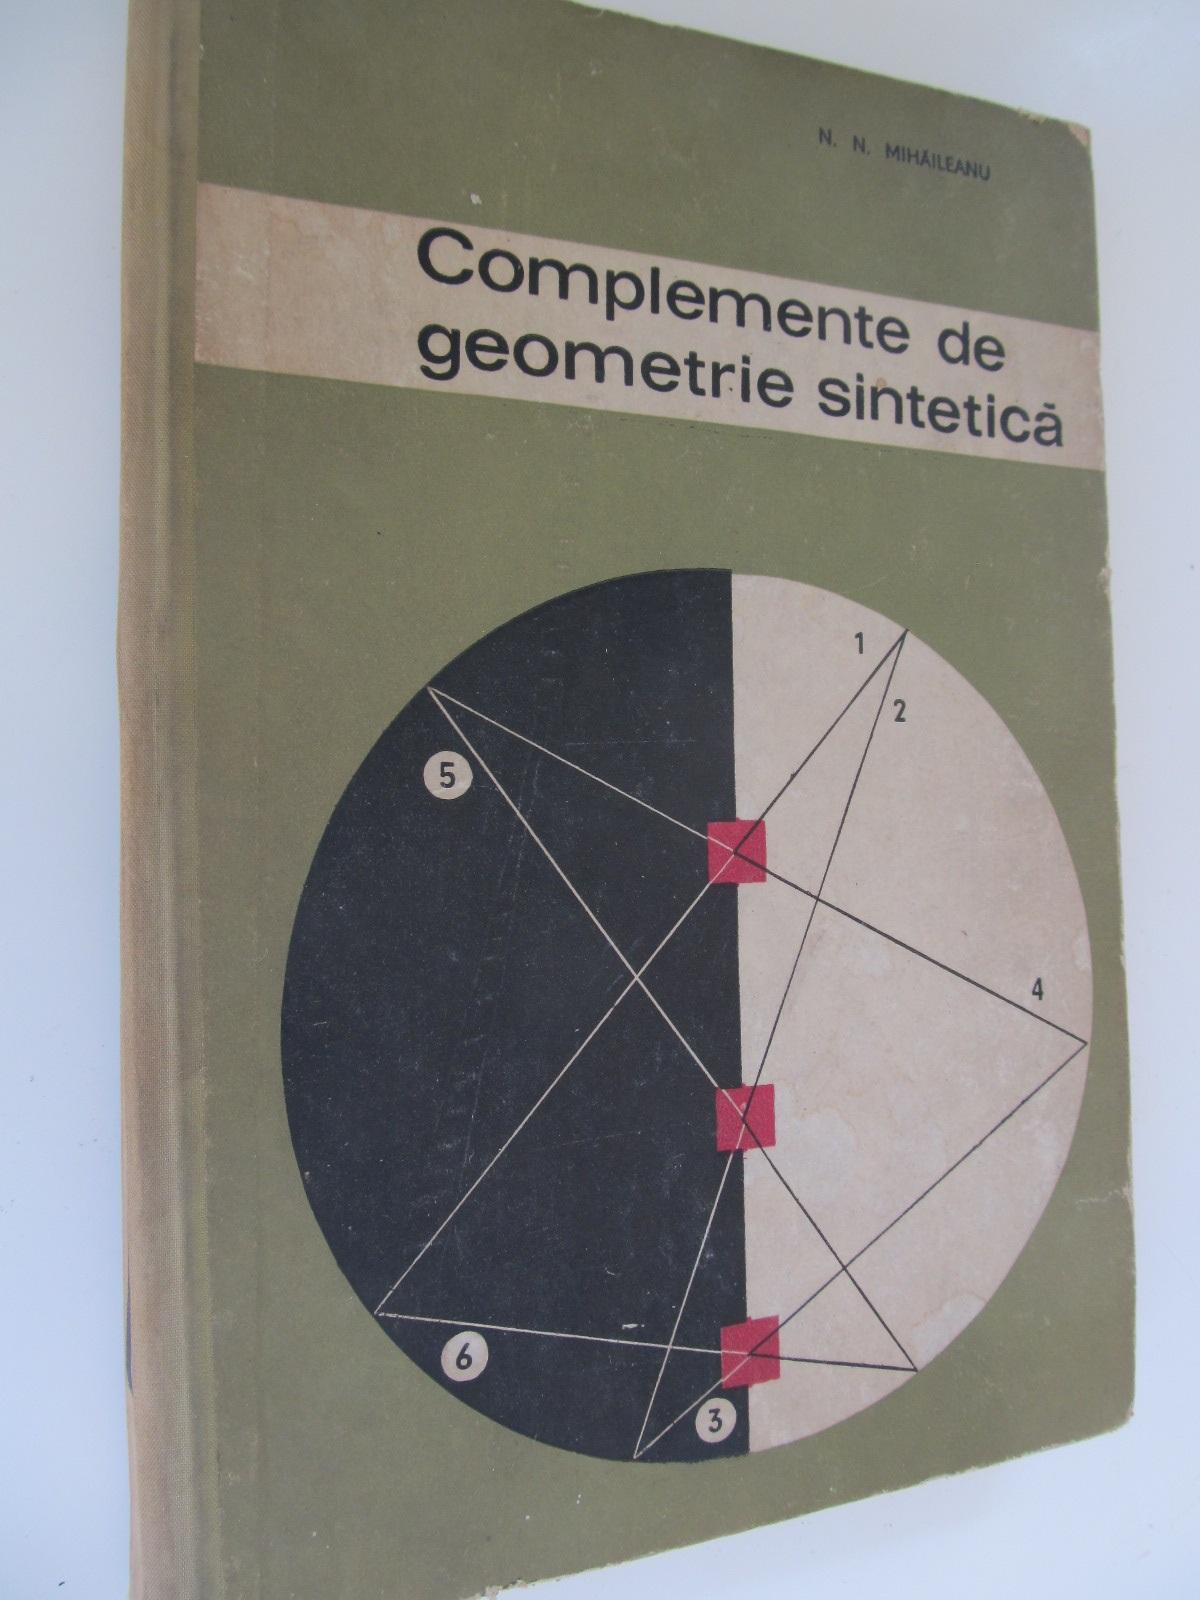 Complemente de geometrie sintetica - N. N. Mihaileanu | Detalii carte